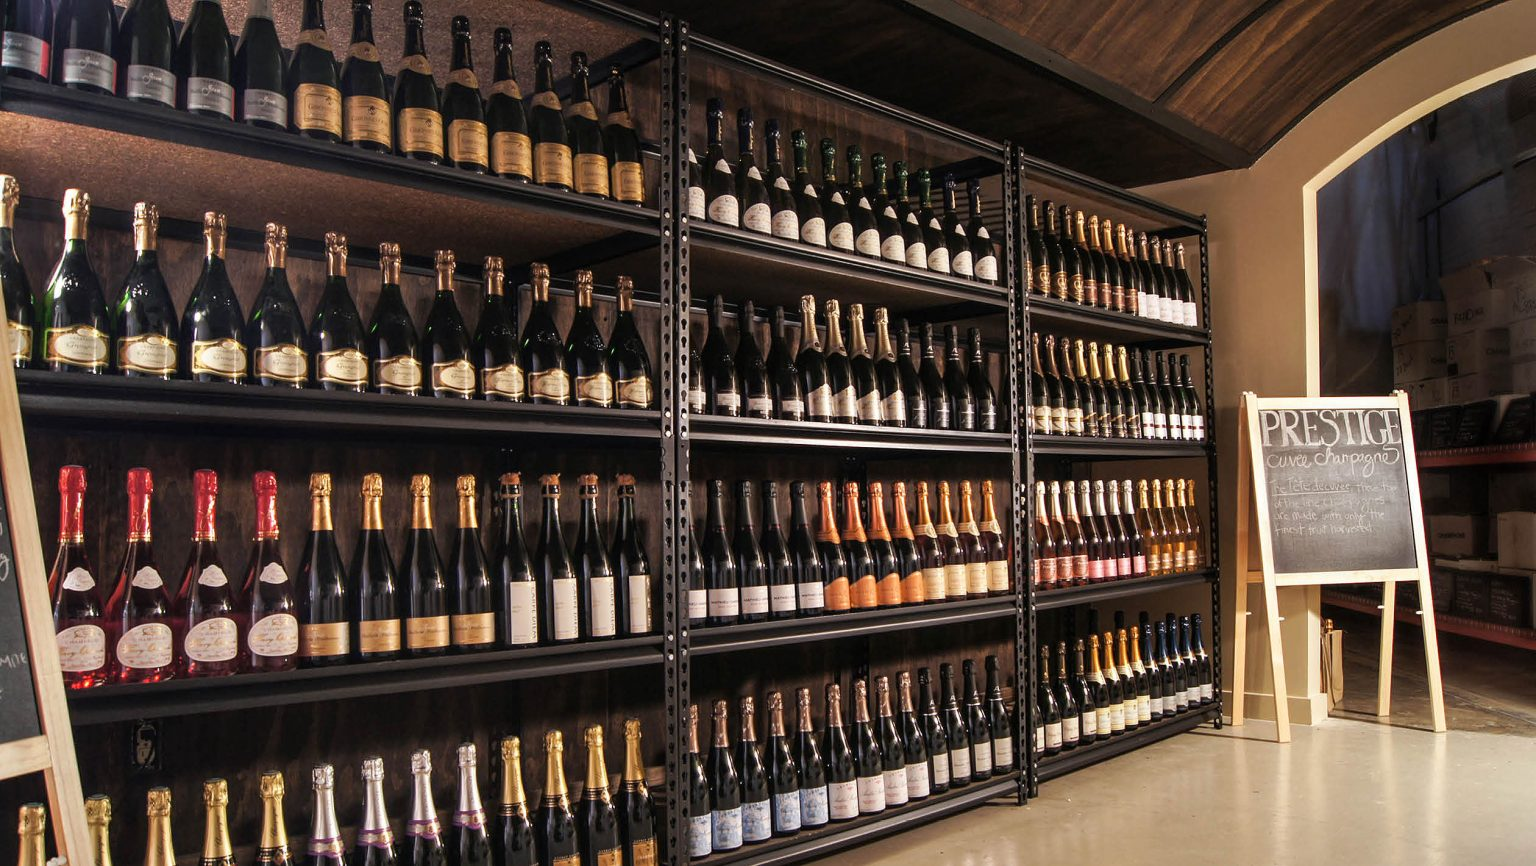 Fat Cork wine selection